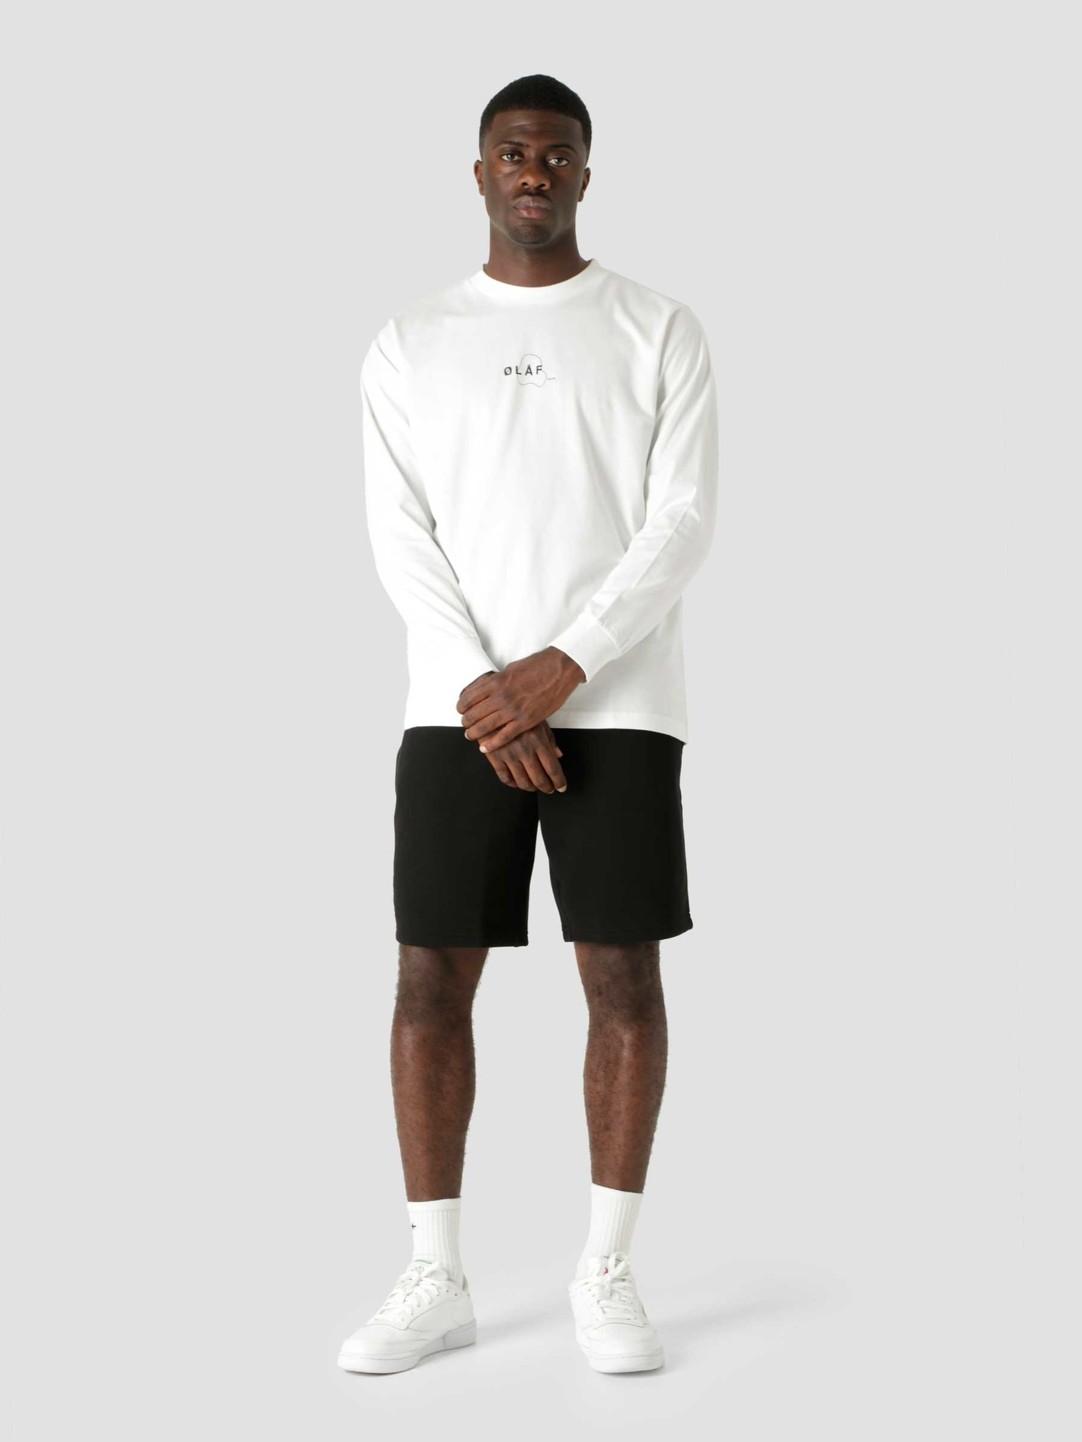 Olaf Hussein Olaf Hussein OLAF Double Mirror Longsleeve T-Shirt White